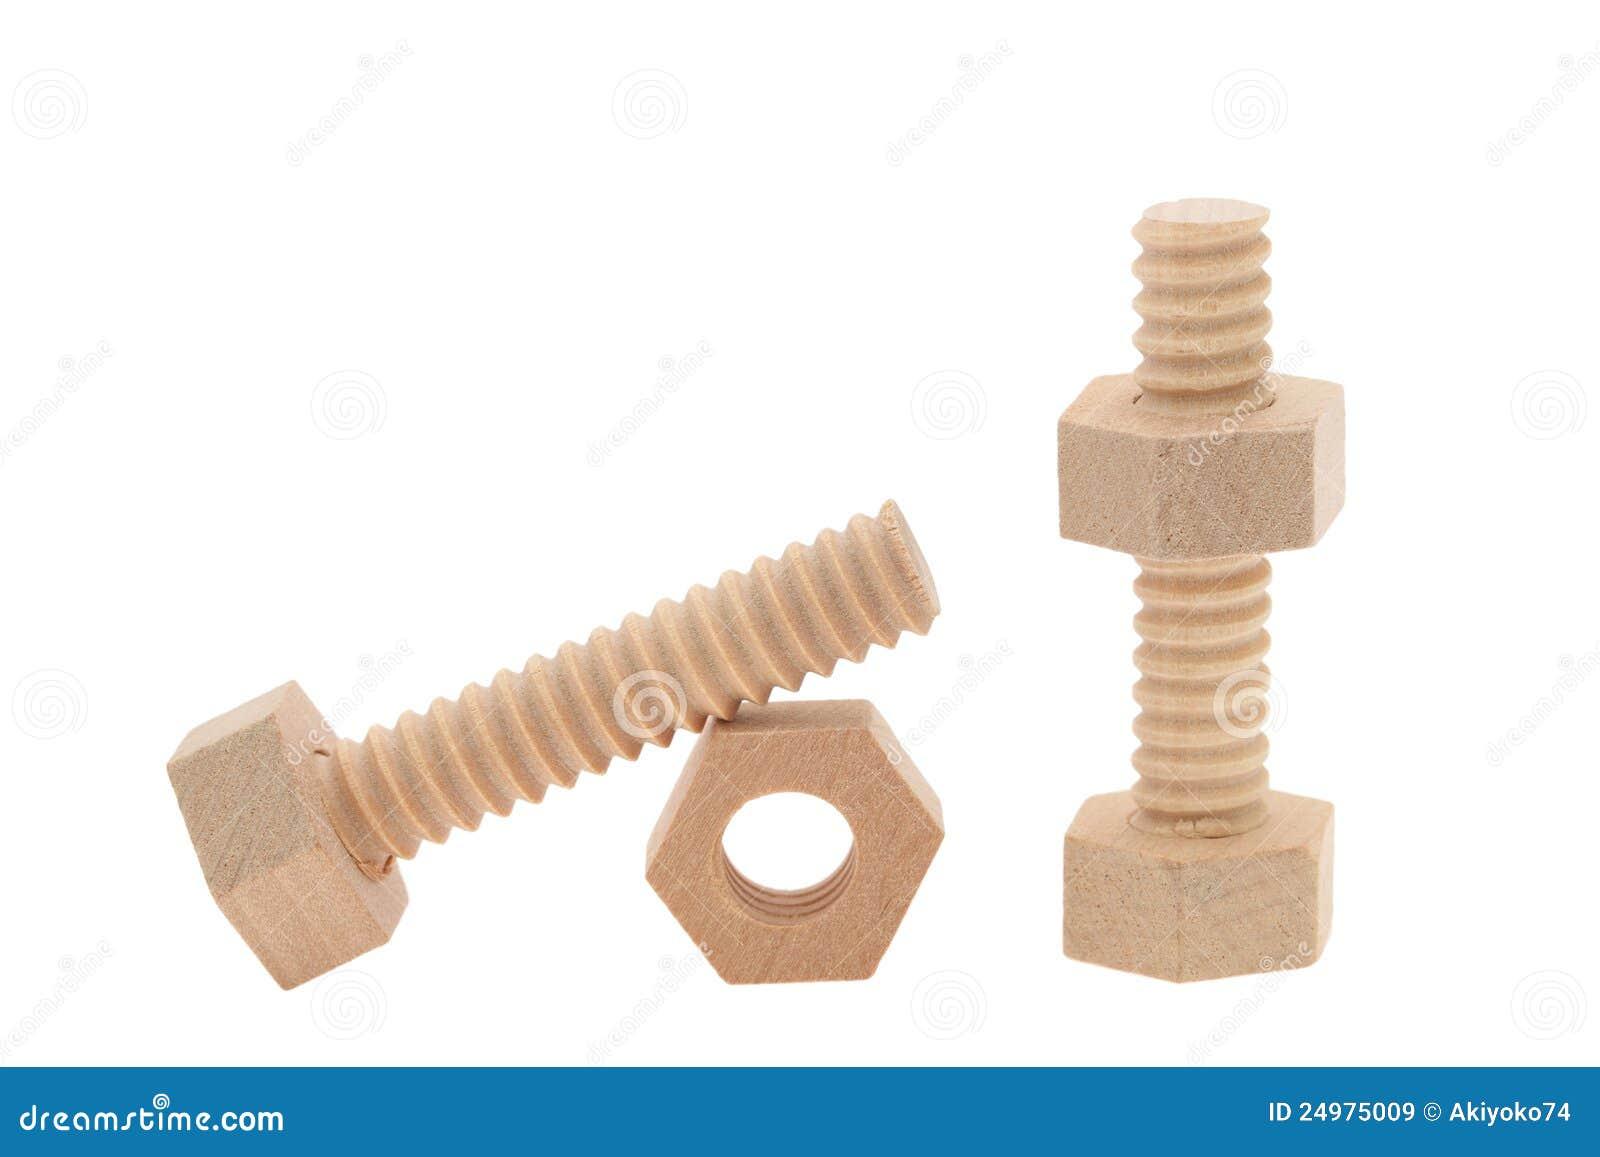 Tuercas de madera y tornillos - Tornillo para madera ...